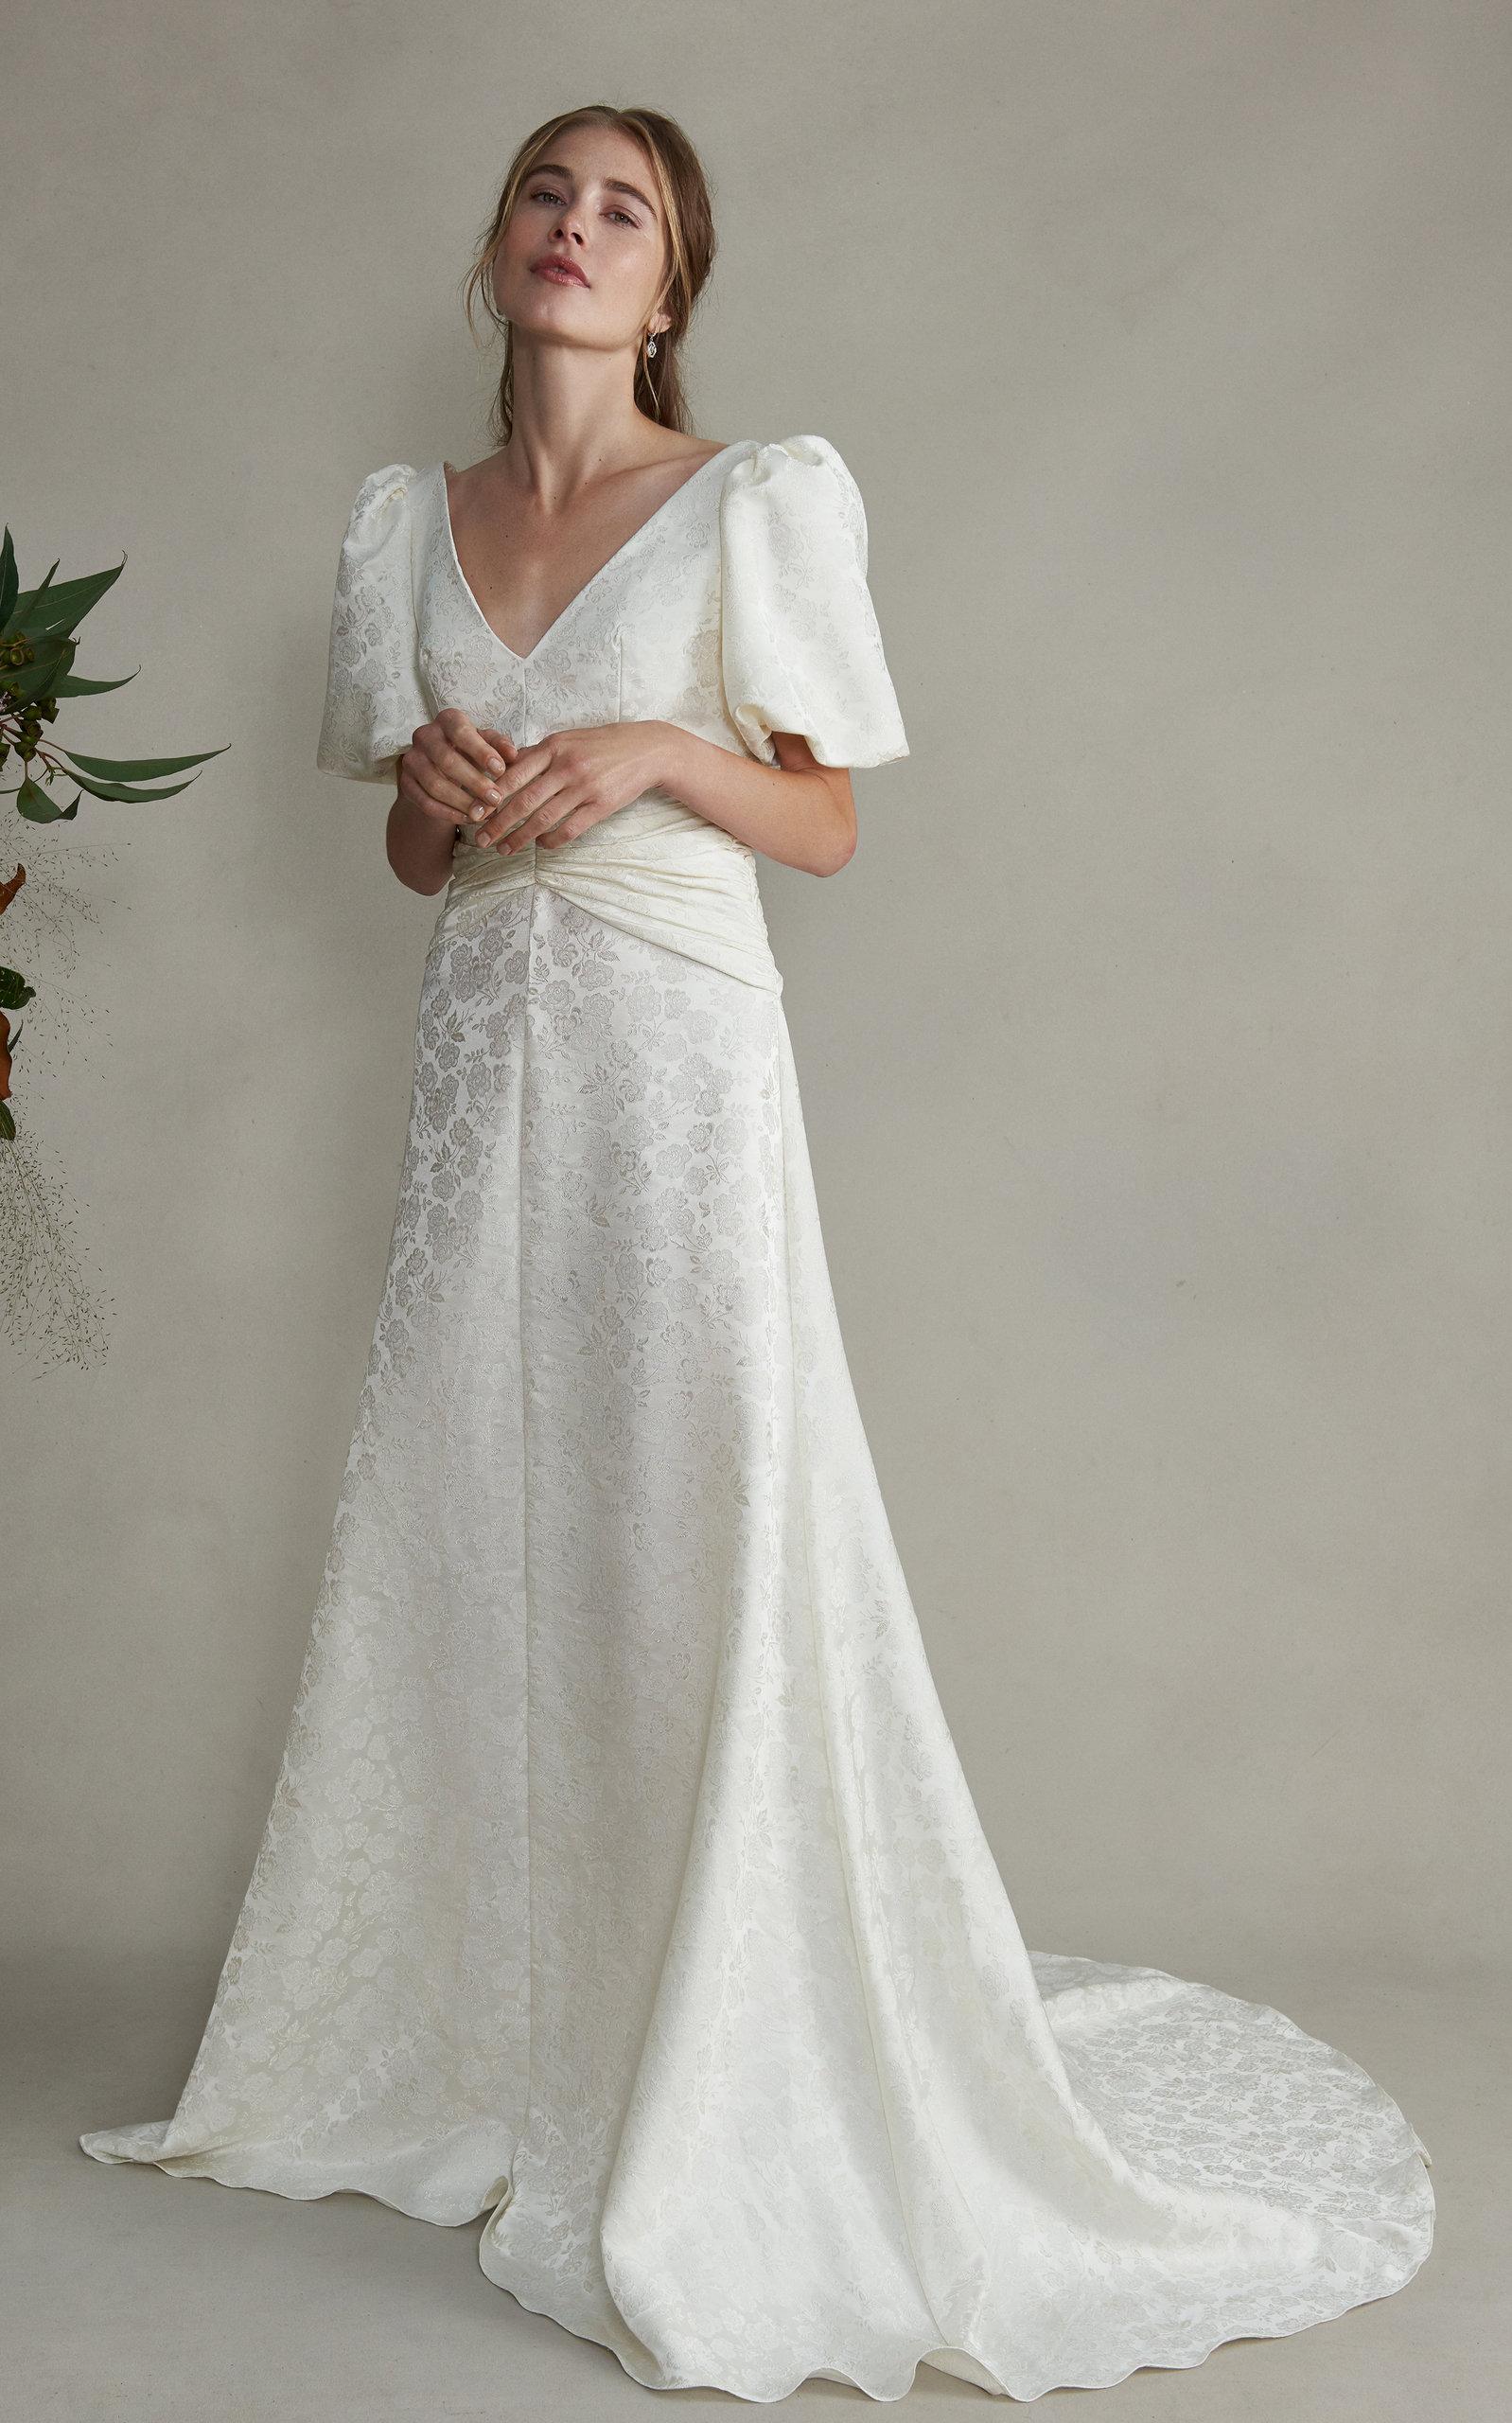 MARKARIAN Esmeralda V-Neck Silk Floral Dress With Train in White